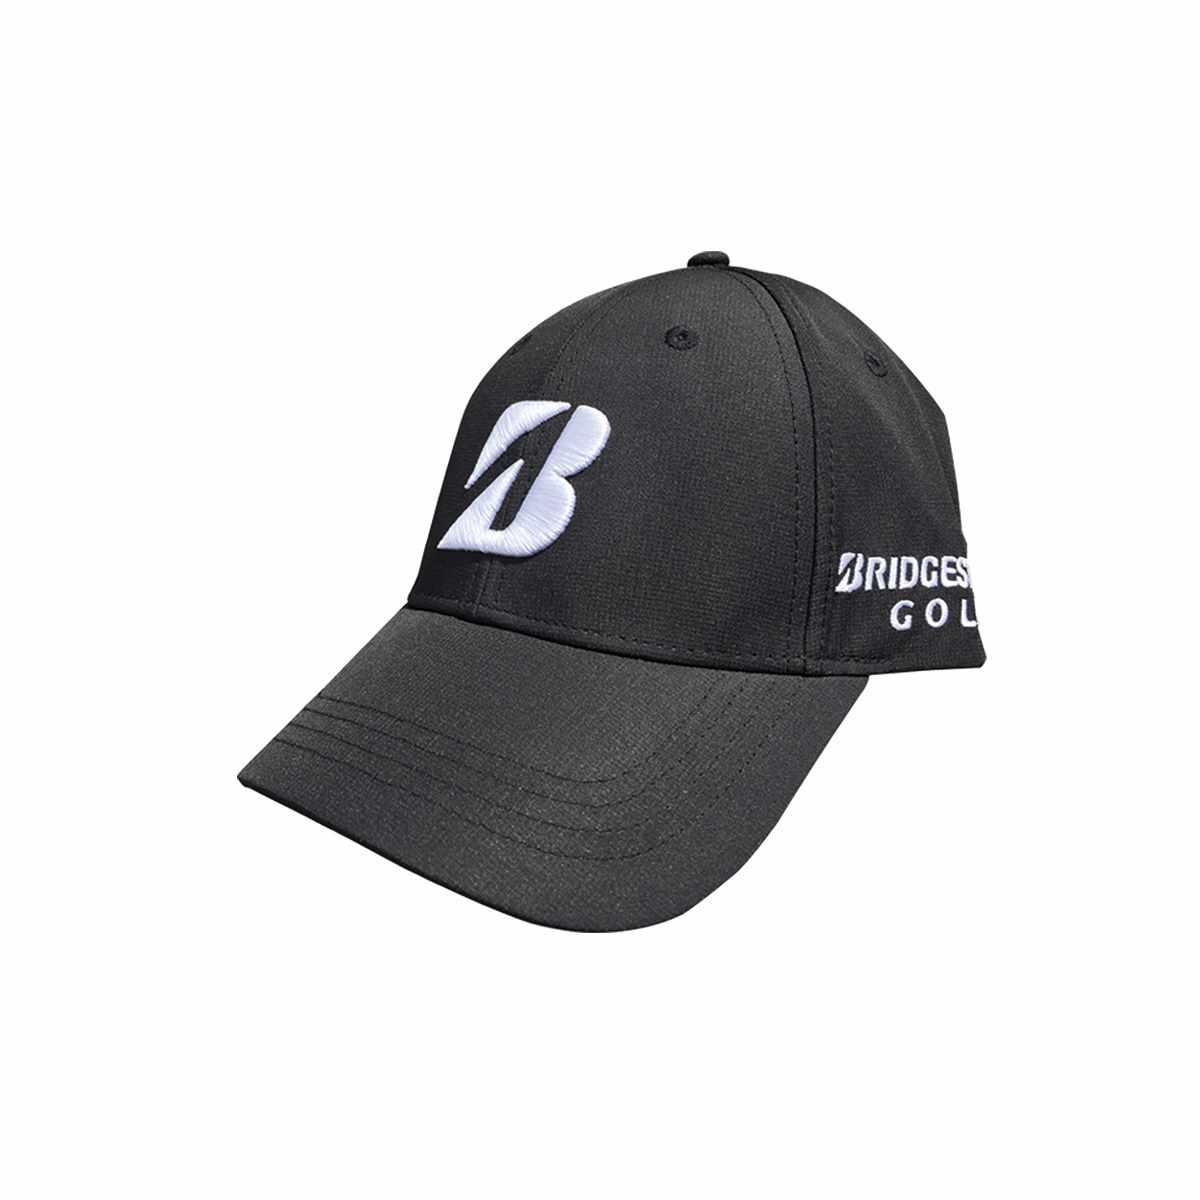 Bridgestone Golf Tour Performance Adjustable Hat - Black 6baf92e79ac